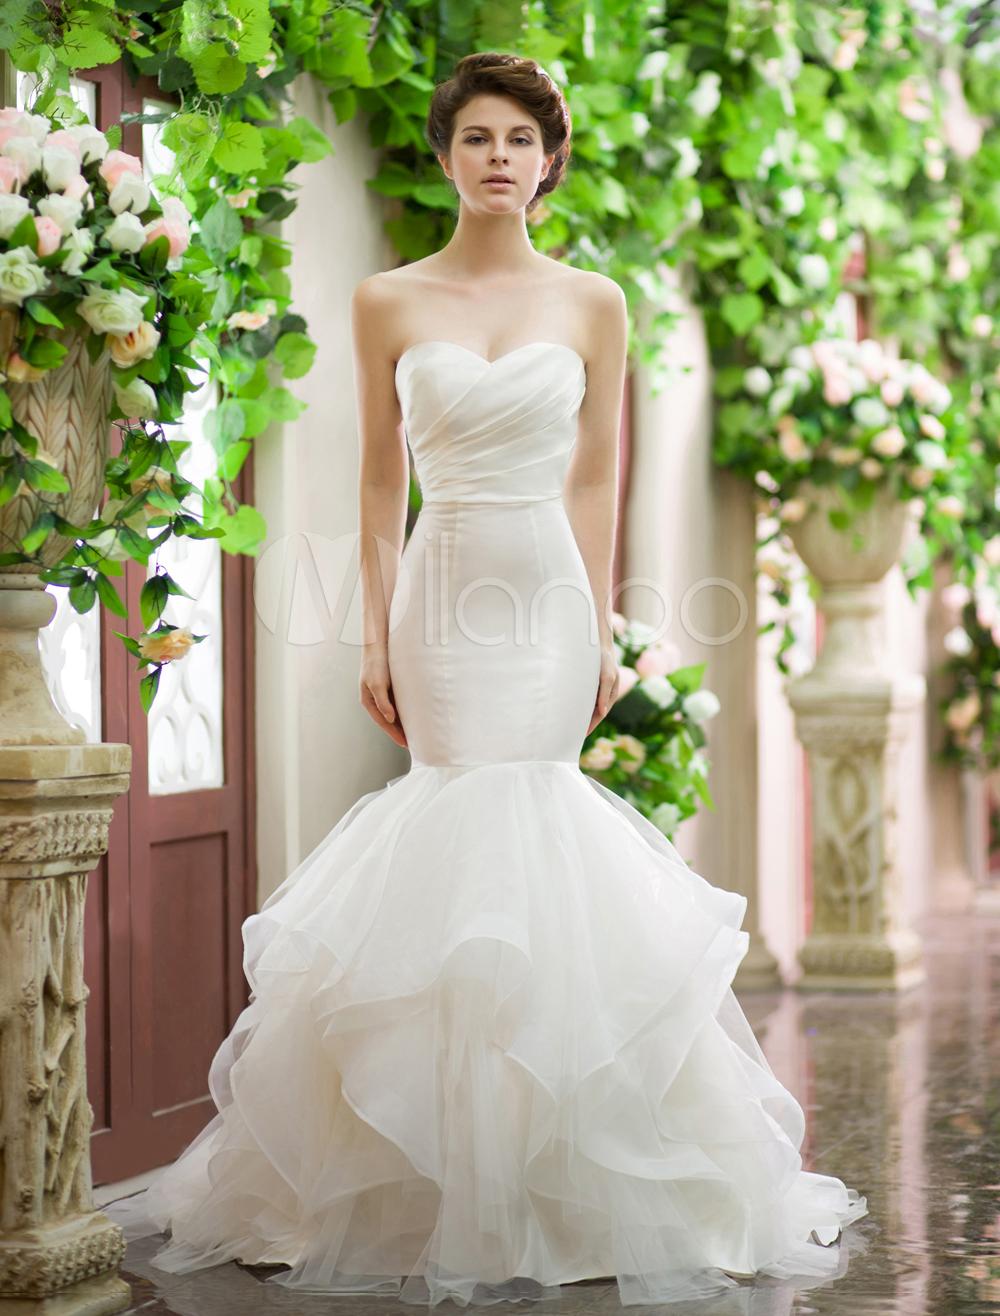 Milanoo / Sweetheart Mermaid Wedding Dress (With images